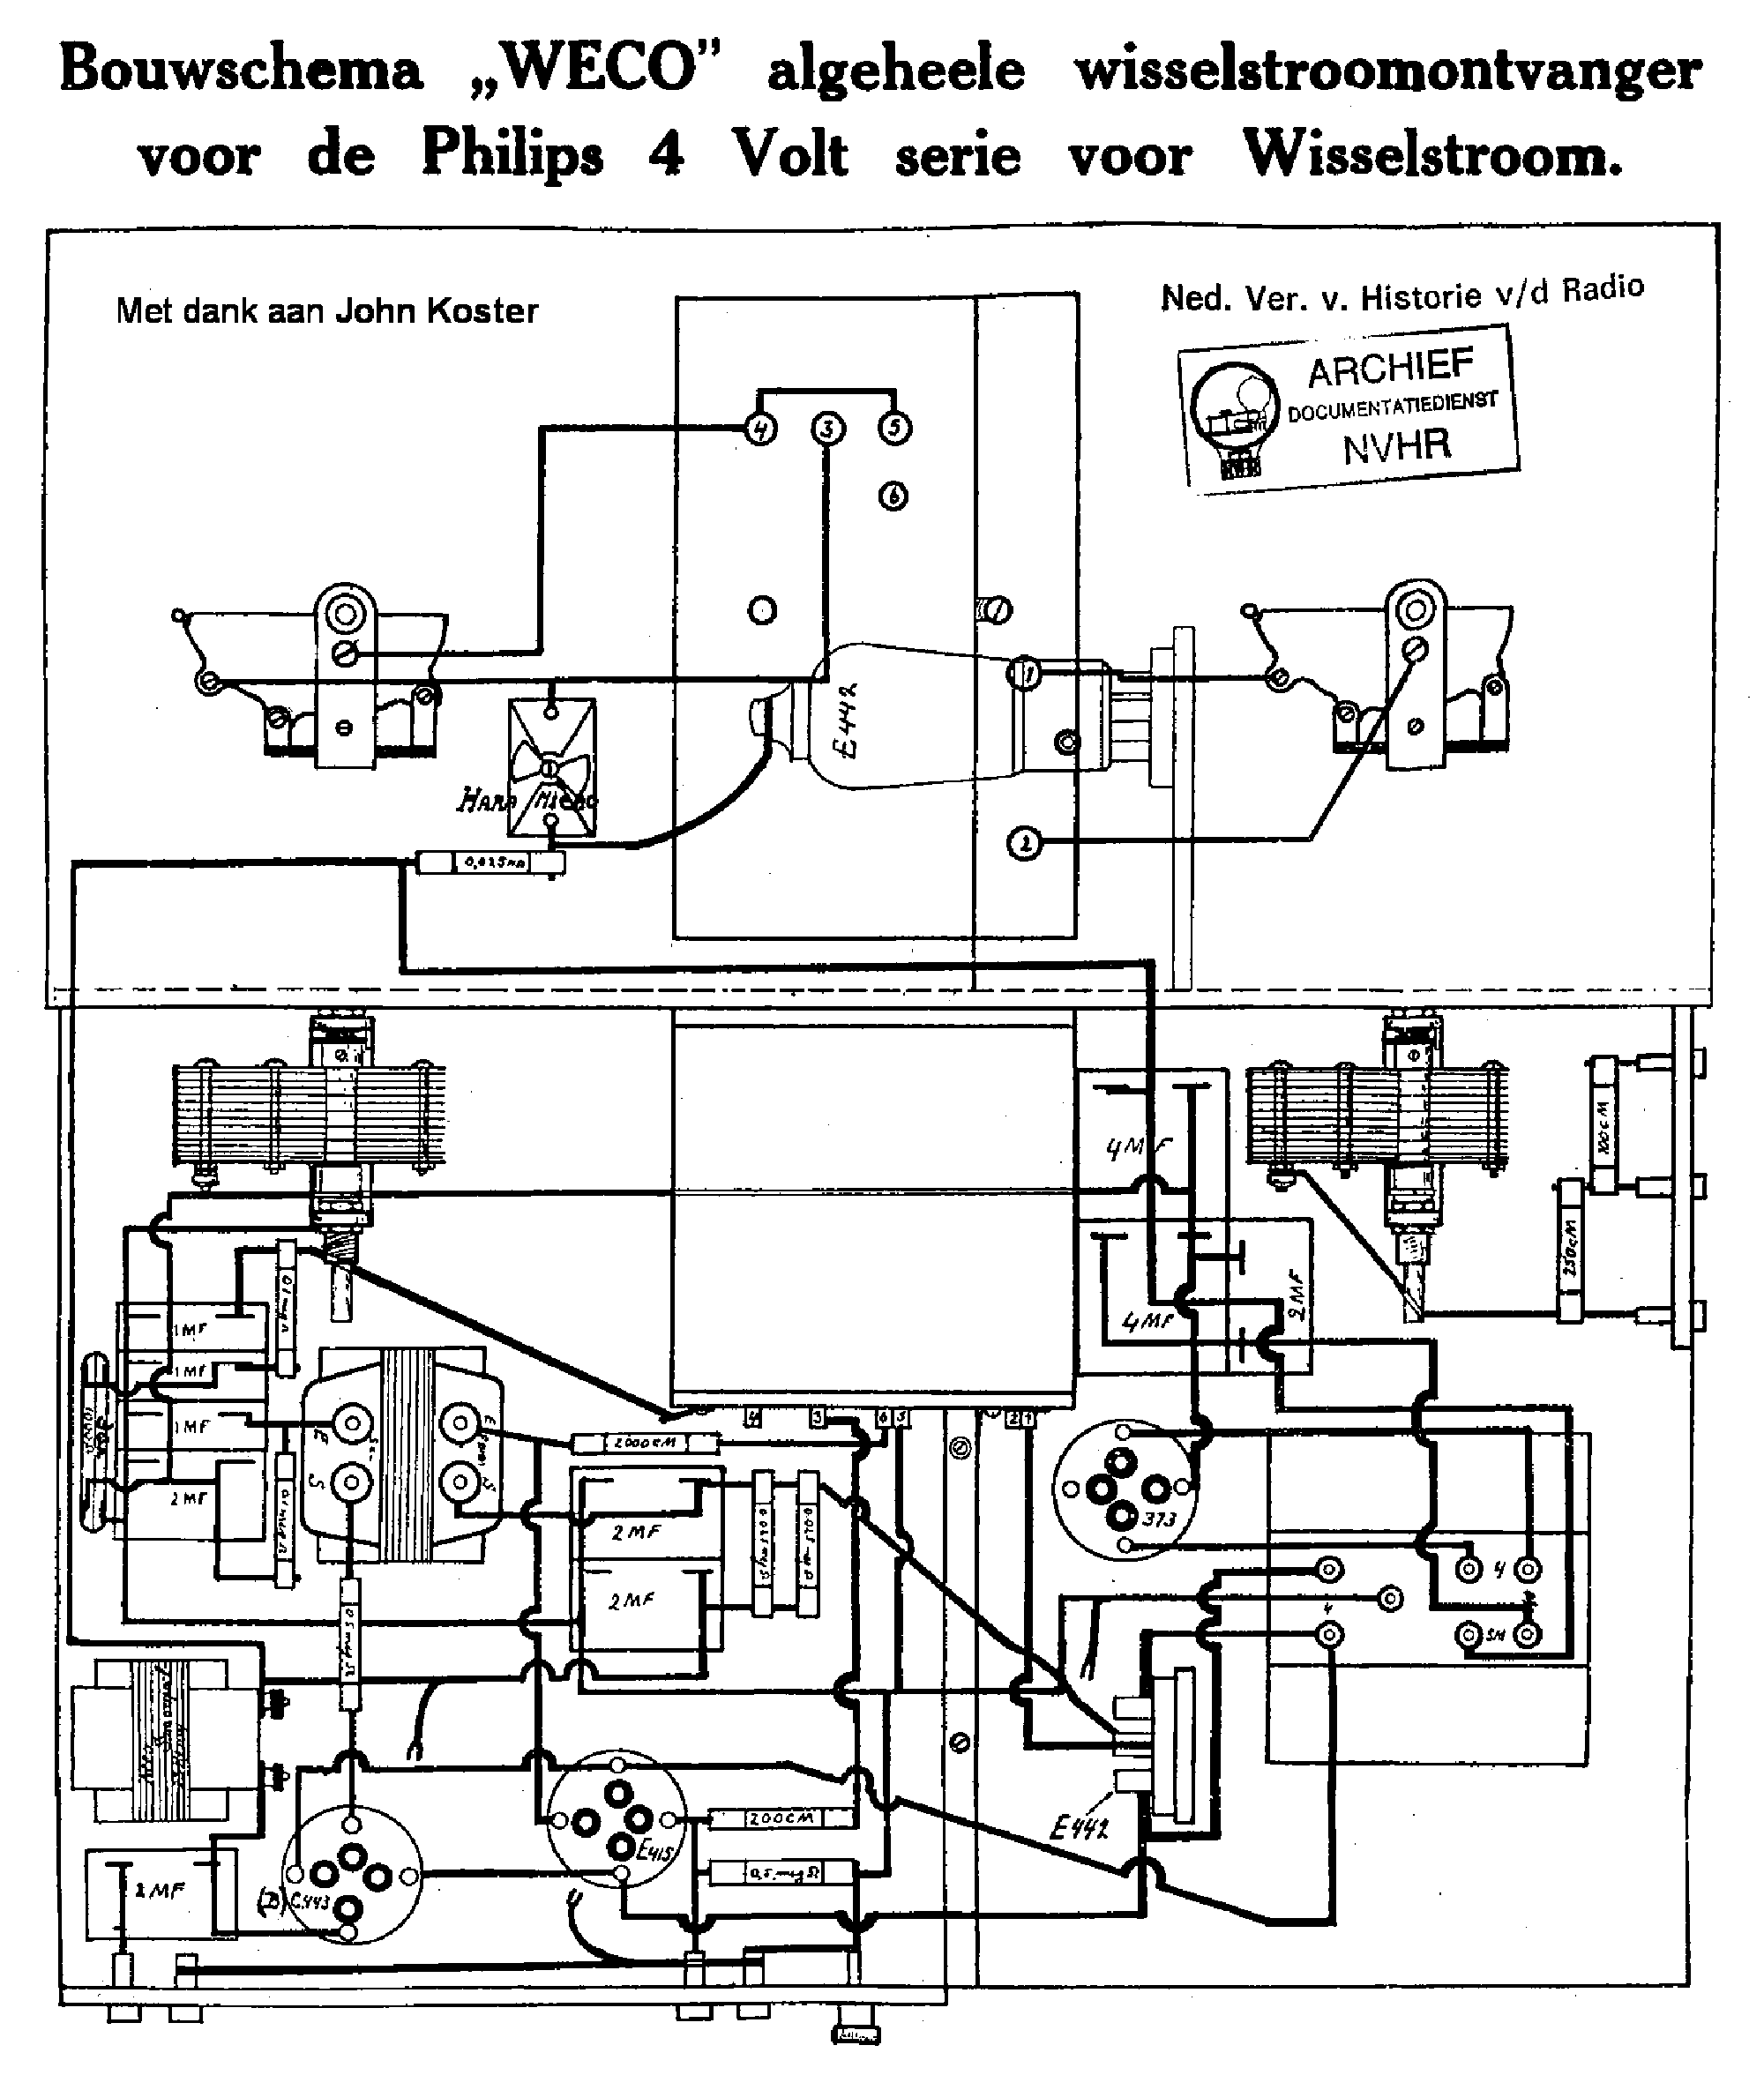 WECO ALGEHEEL-WISSELSTROOM EARLY AC RECEIVER SCH service manual (1st page)